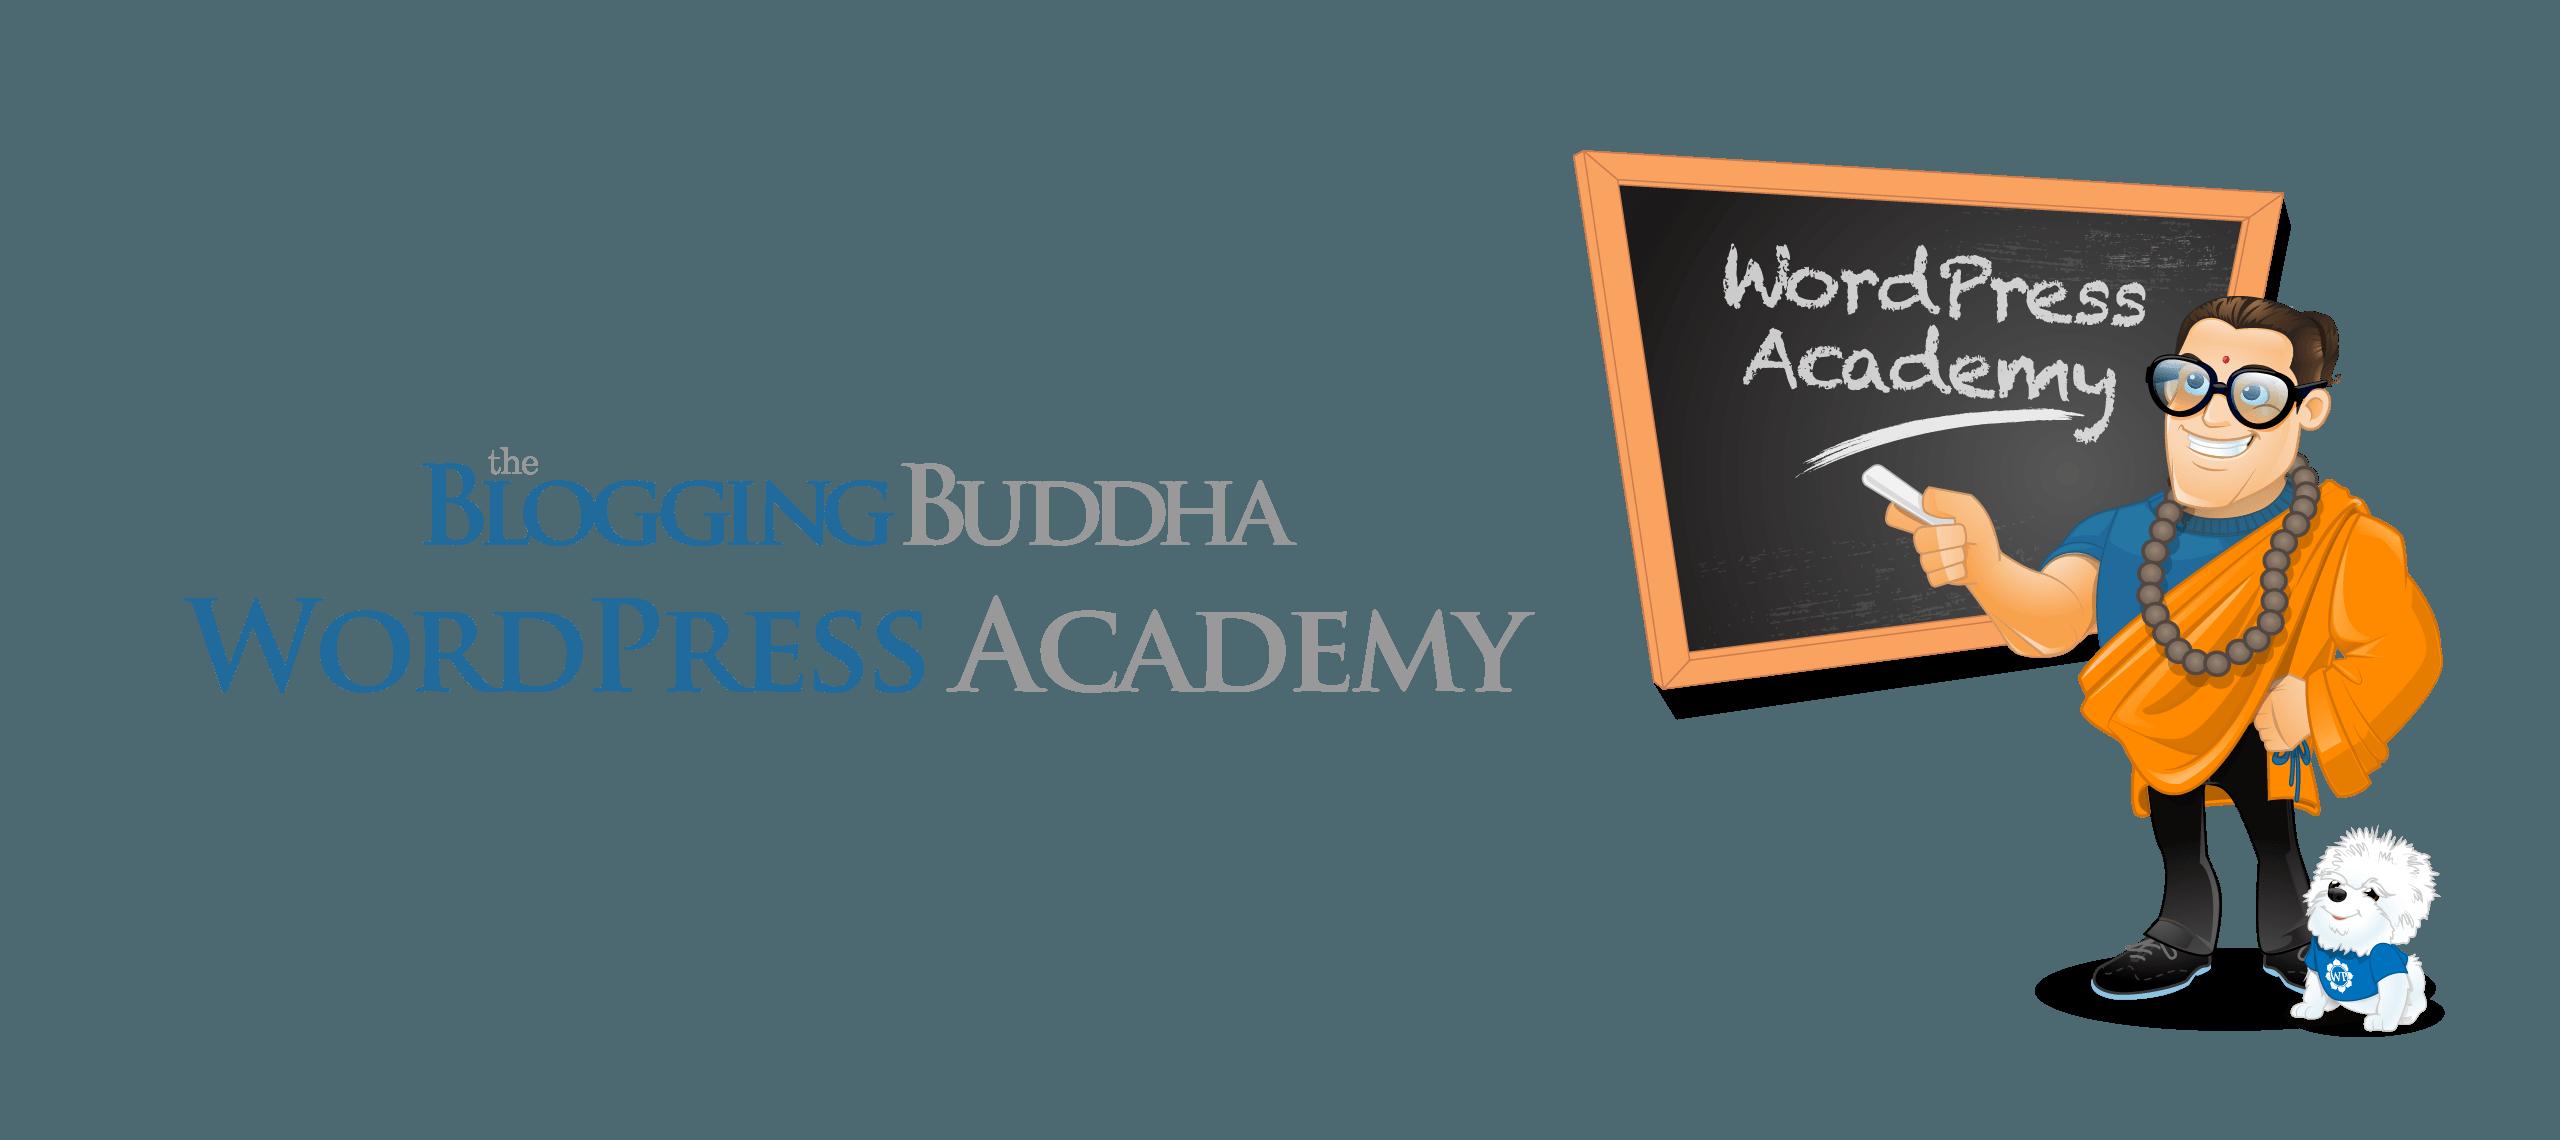 TheBloggingBuddha WordPress Academy